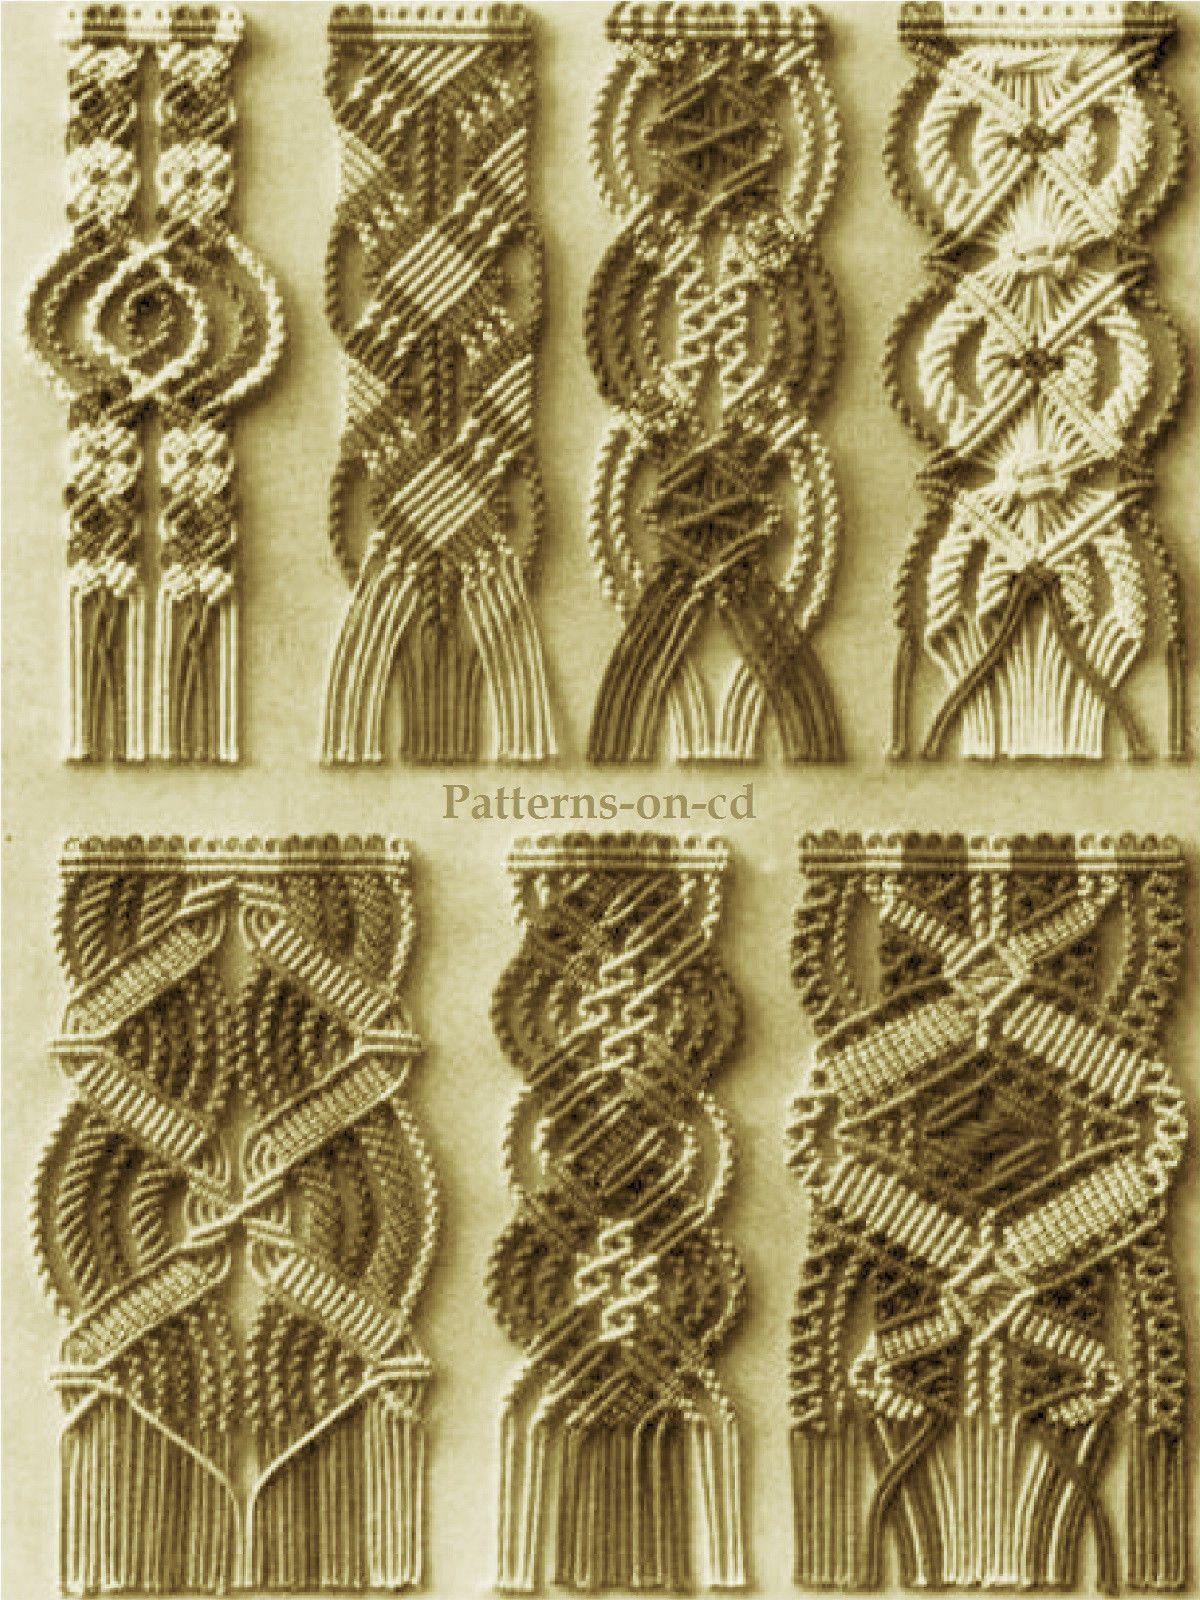 Vintage Instruction MACRAME bracelet beads cord weaving Patterns on CD in Crafts, Beads & Jewellery Making, Books & Magazines | eBay